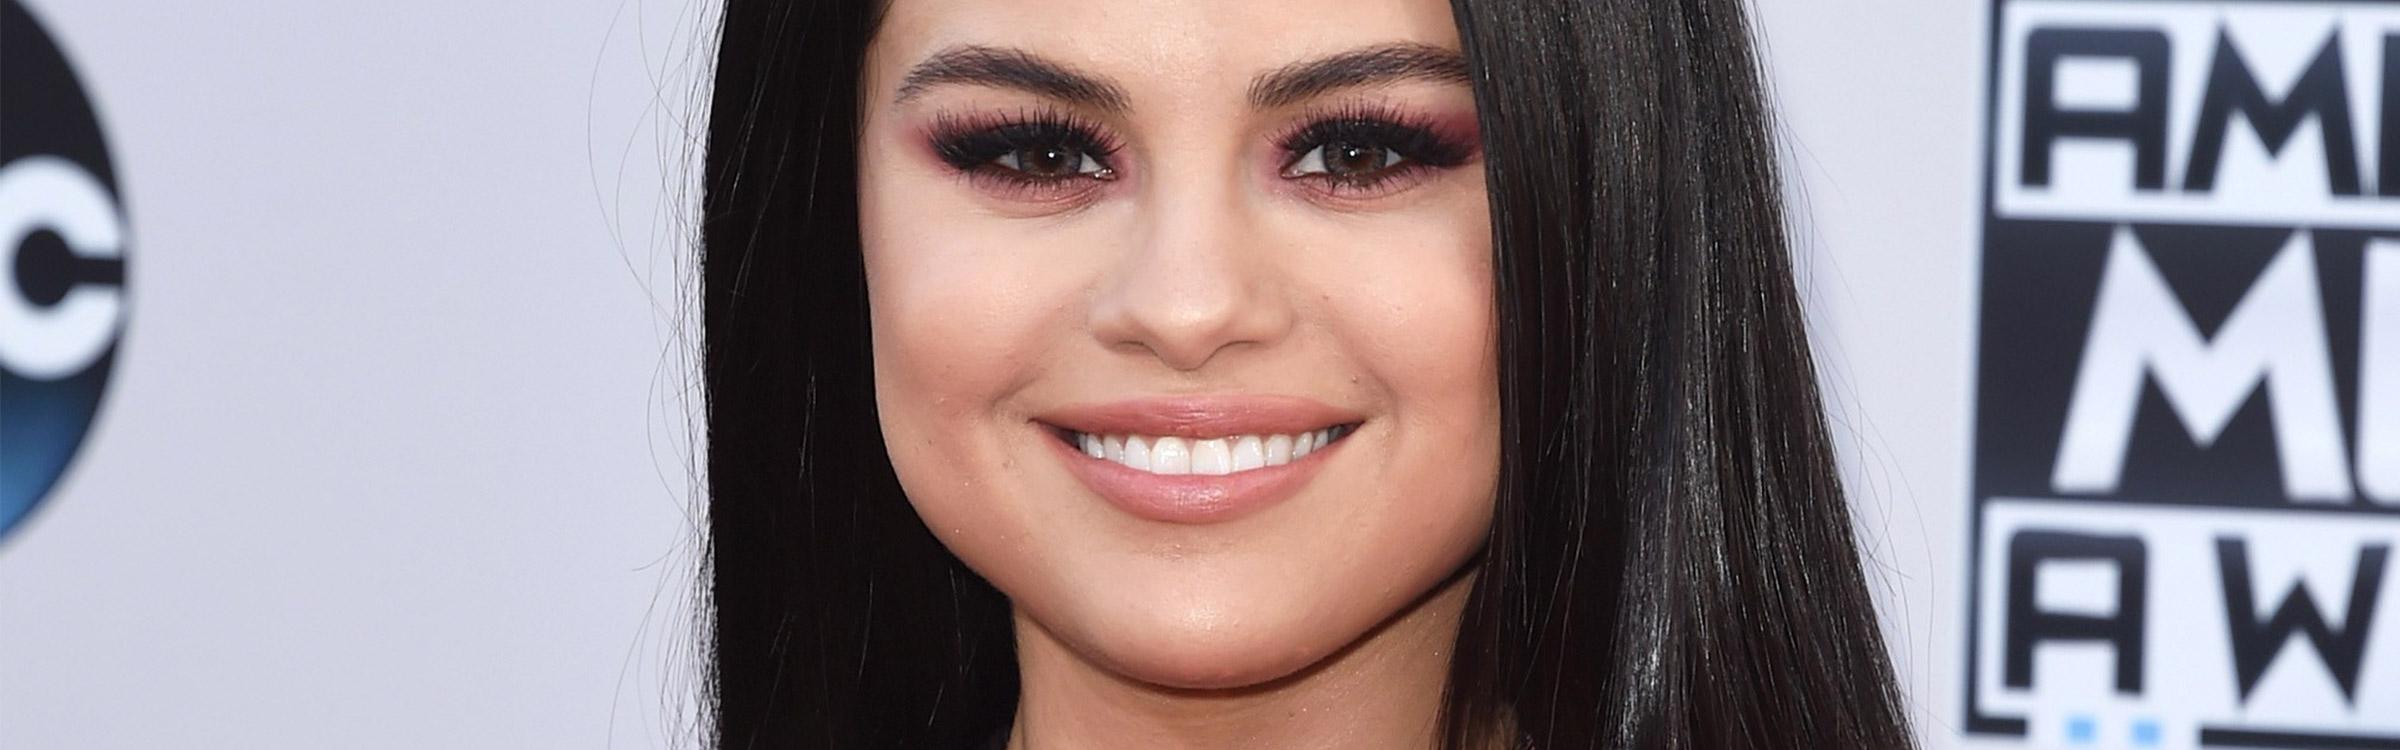 Selena headerafbeelding